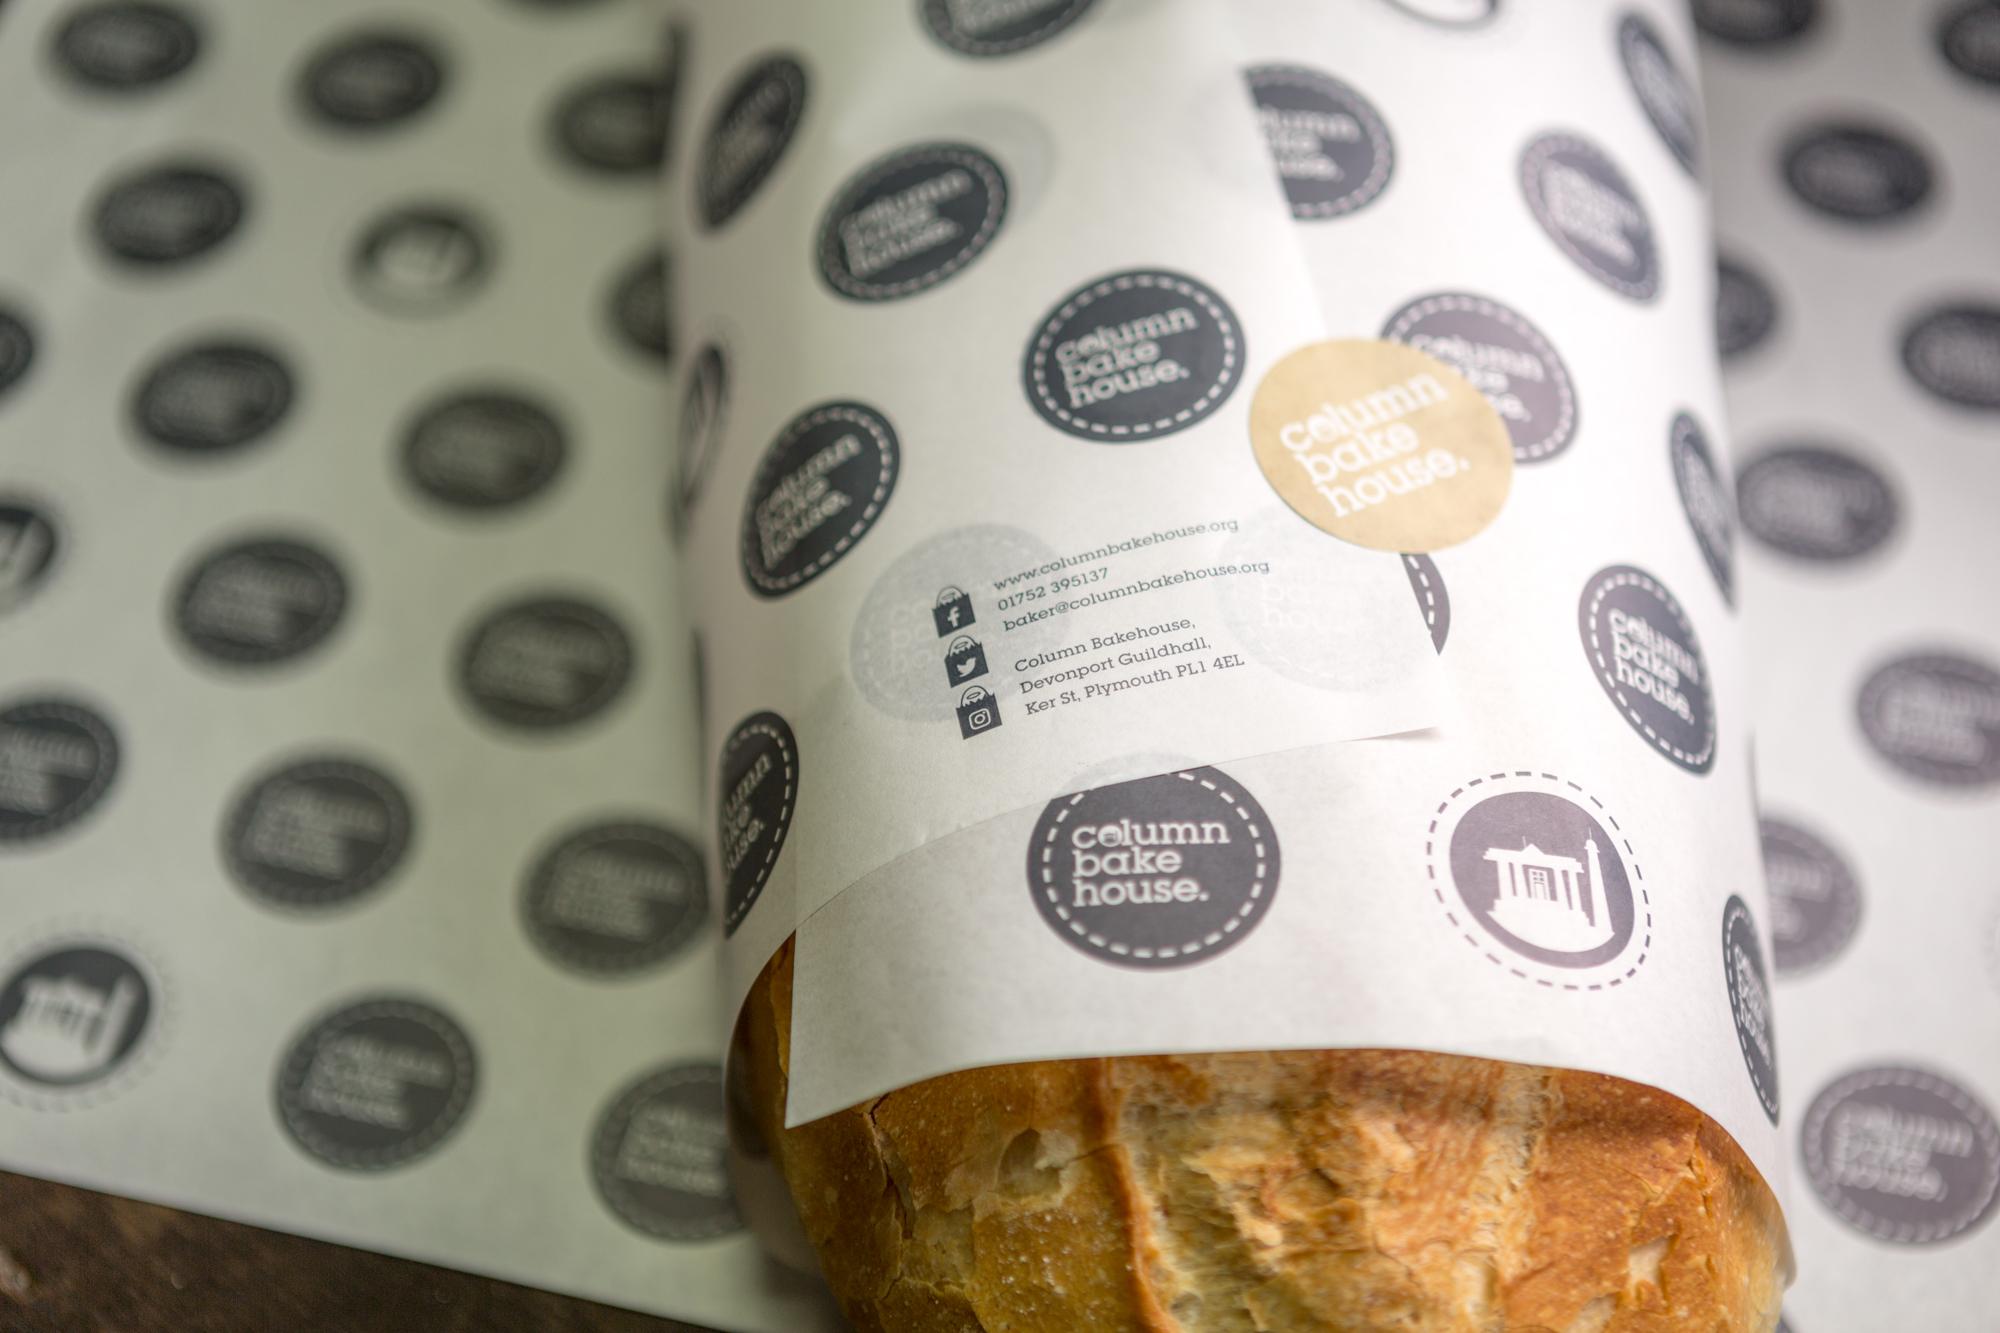 Column-bakehouse-bread-wrapped-in-paper-2017.jpg